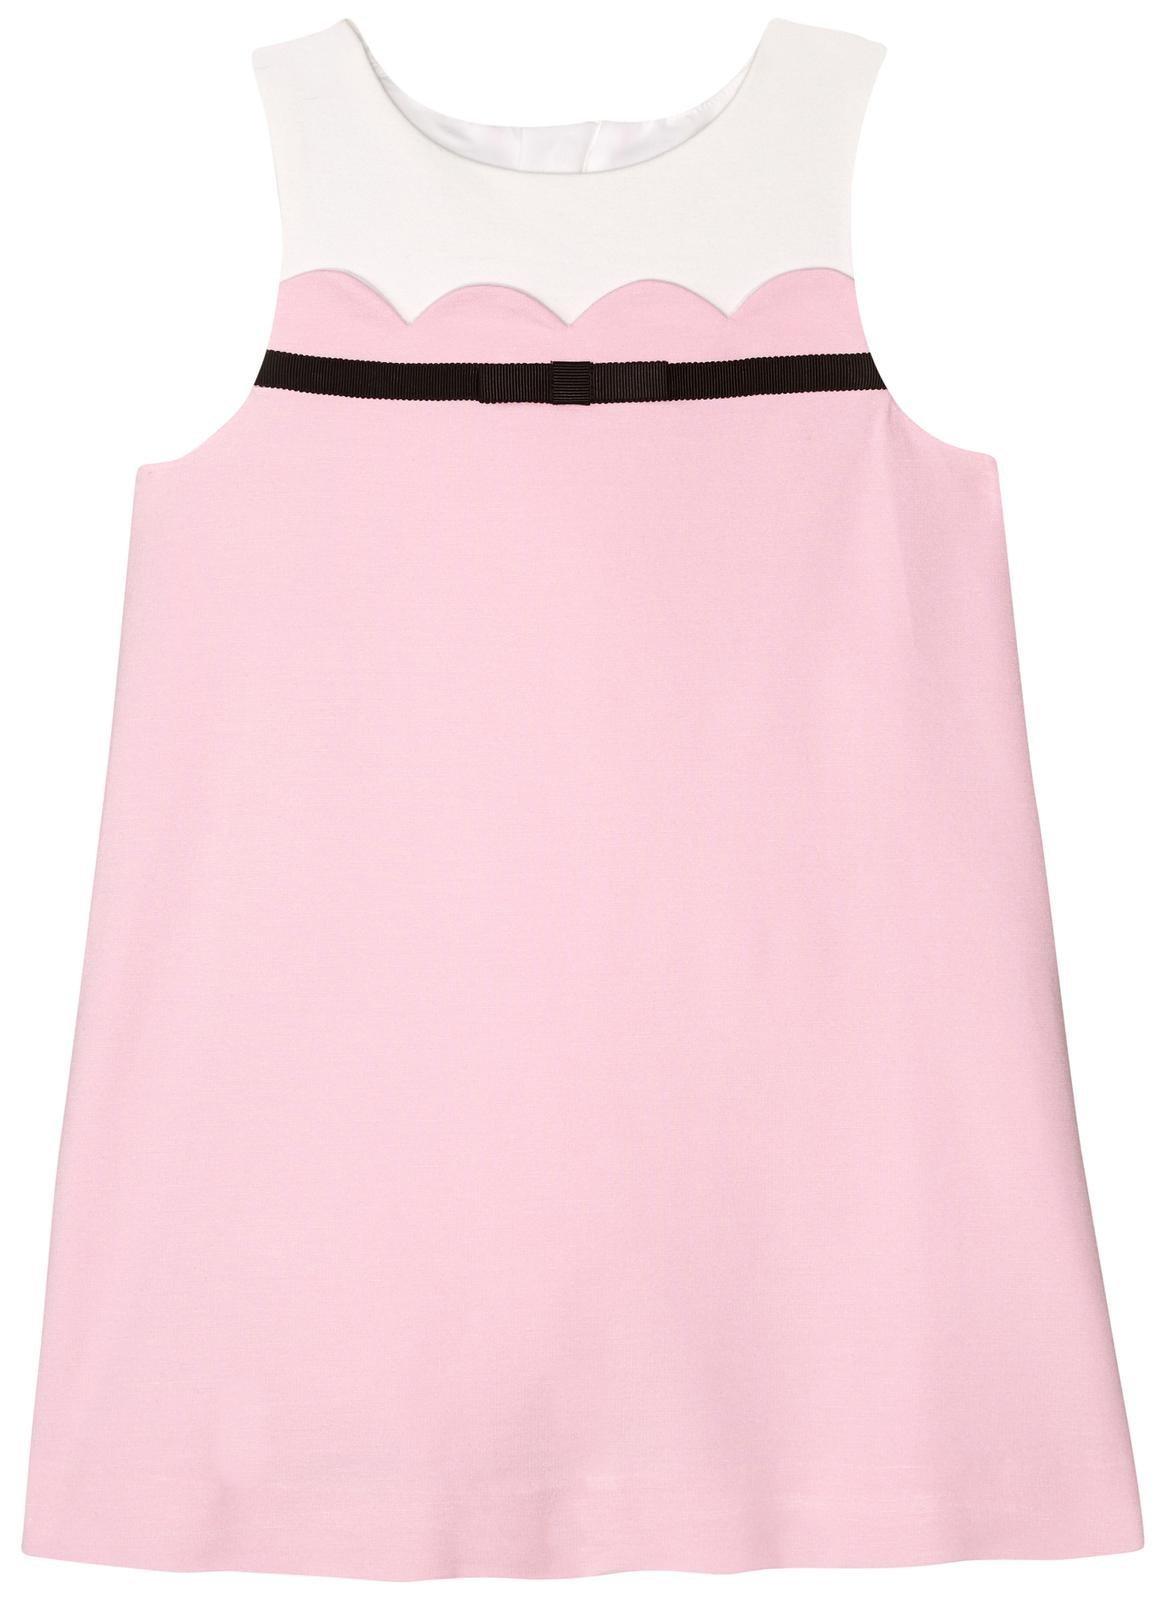 kate spade new york Girls' Scallop Dress, Cherry Blossom, 5 by Kate Spade New York